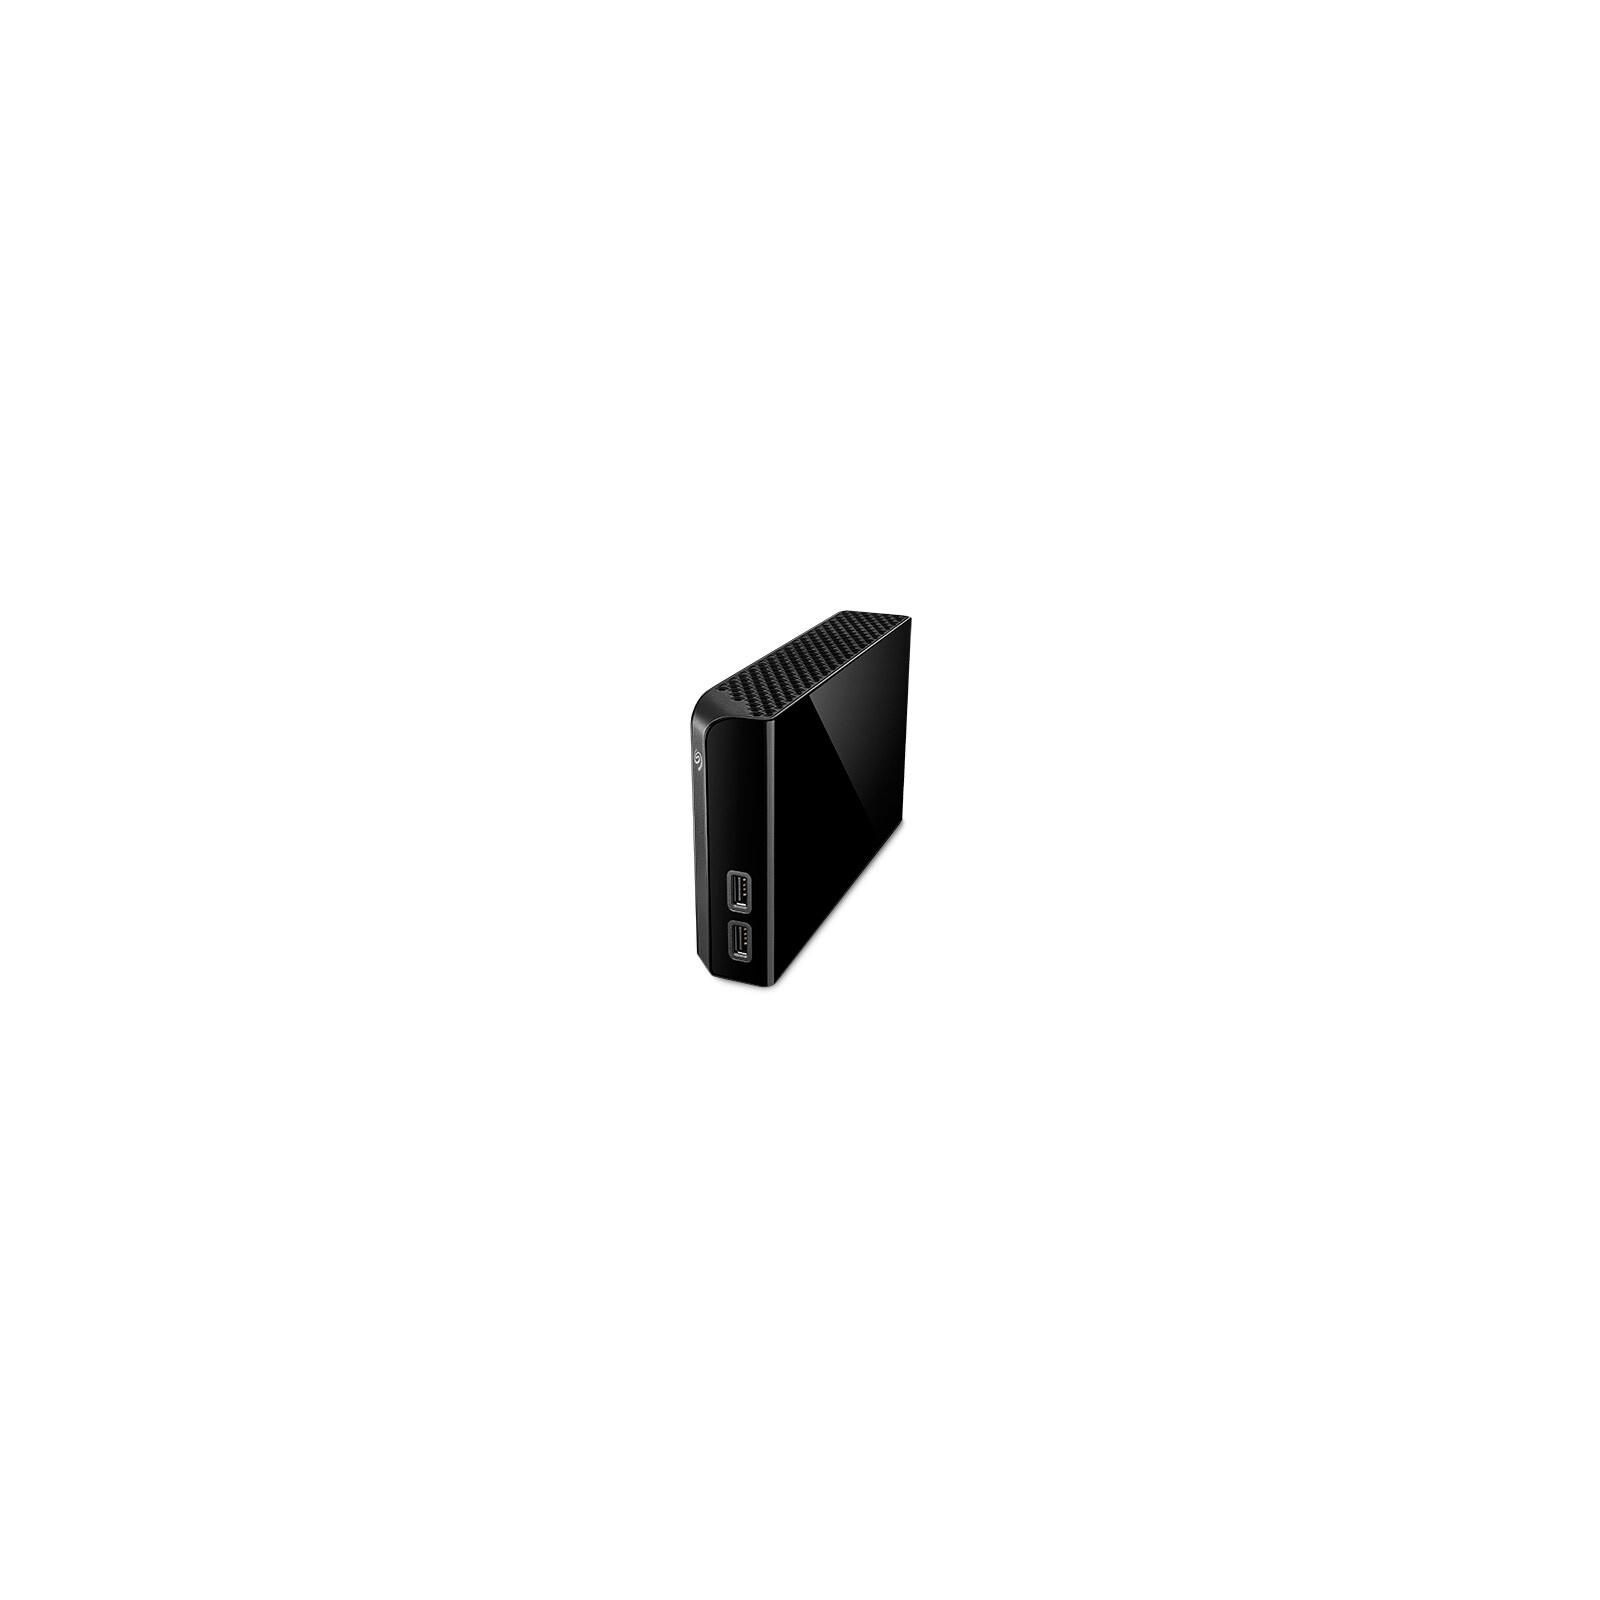 Seagate Backup Plus Hub 12TB HDD